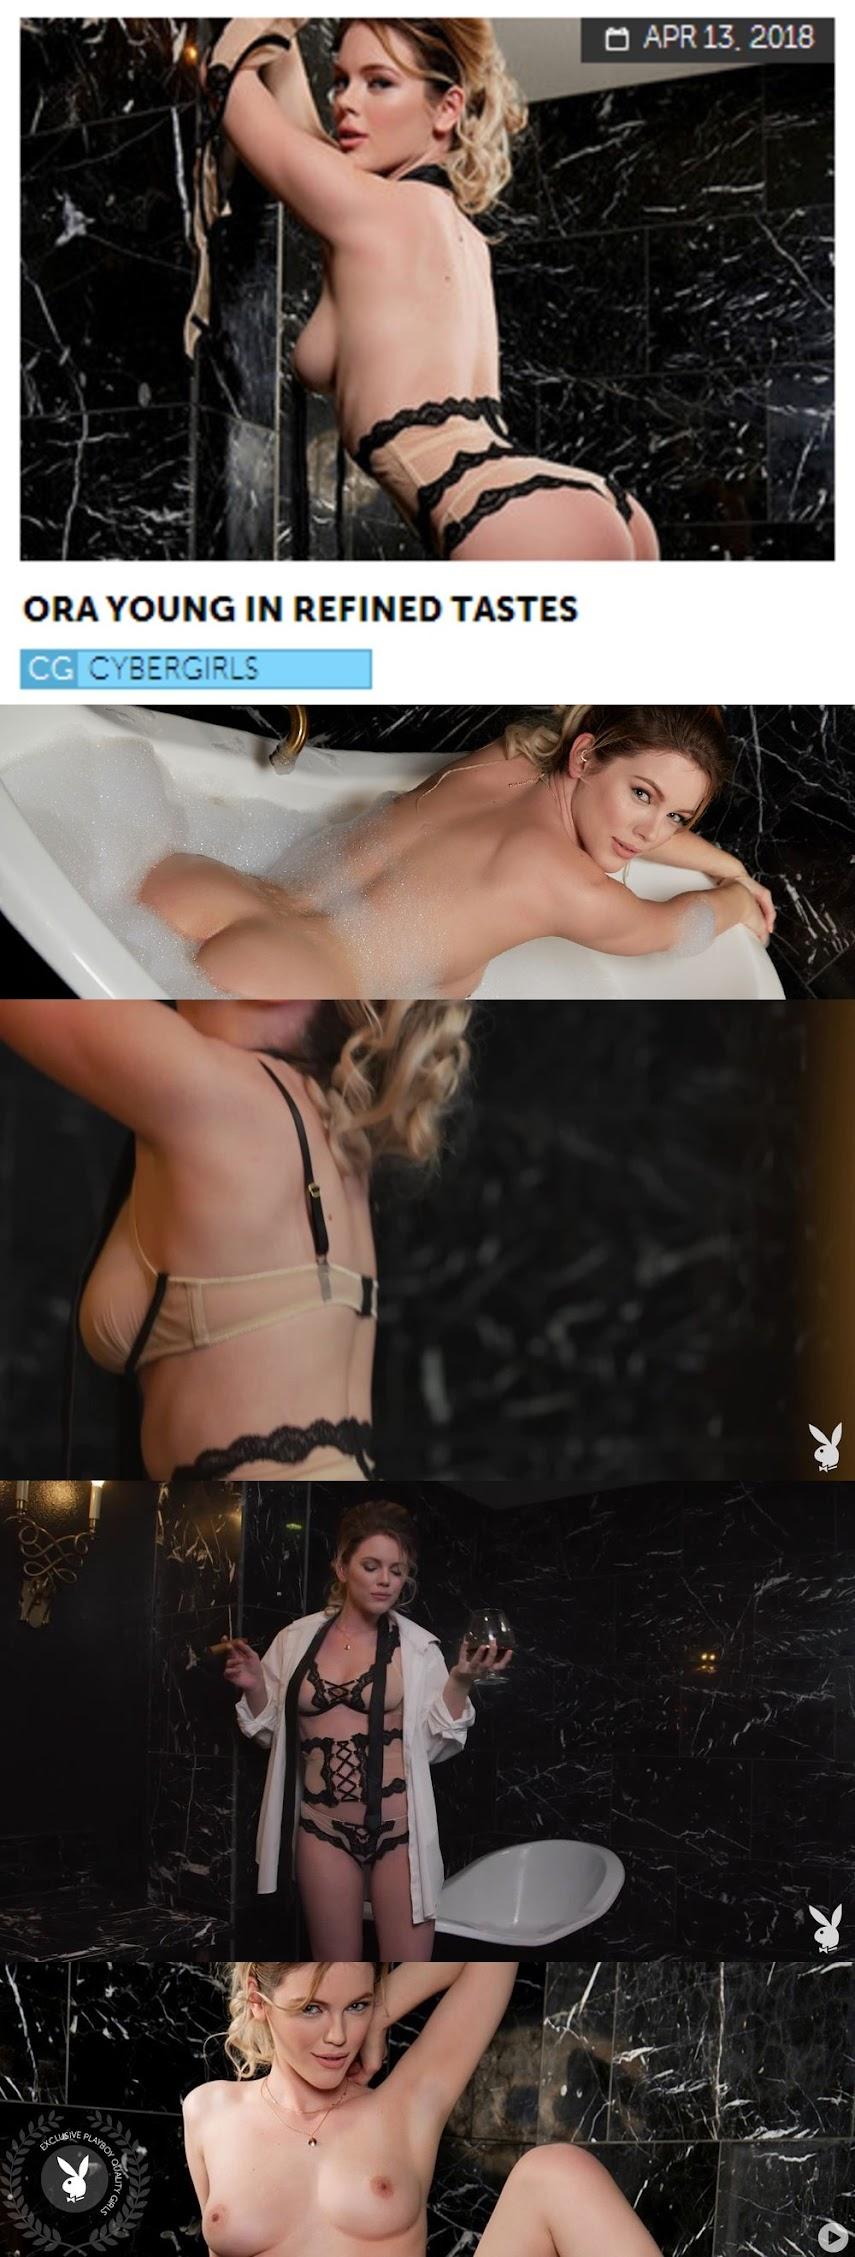 Playboy PlayboyPlus2018-04-13 Ora Young in Refined Tastes